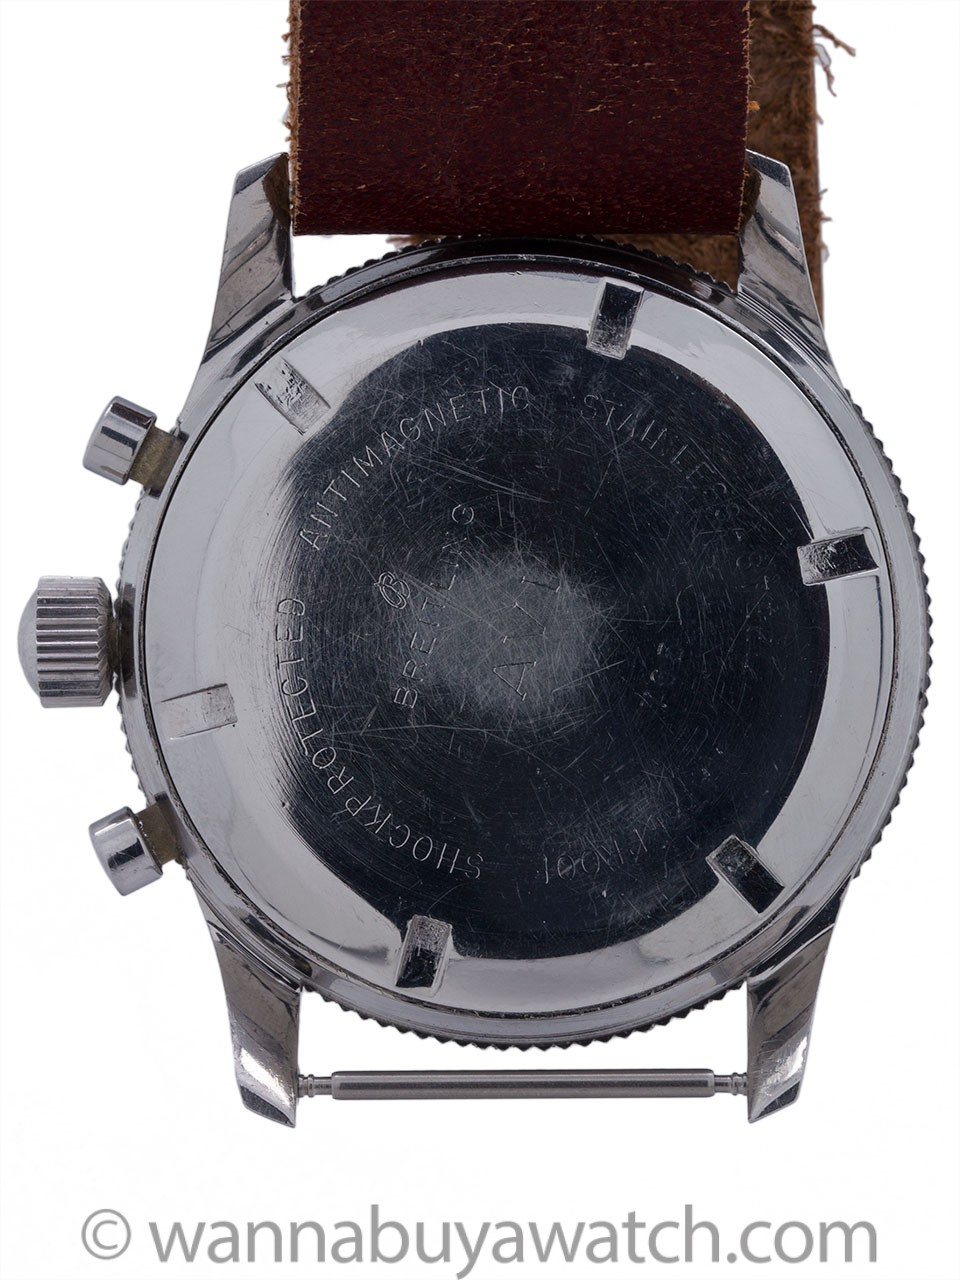 Vintage Breitling AVI ref #765 circa 1965